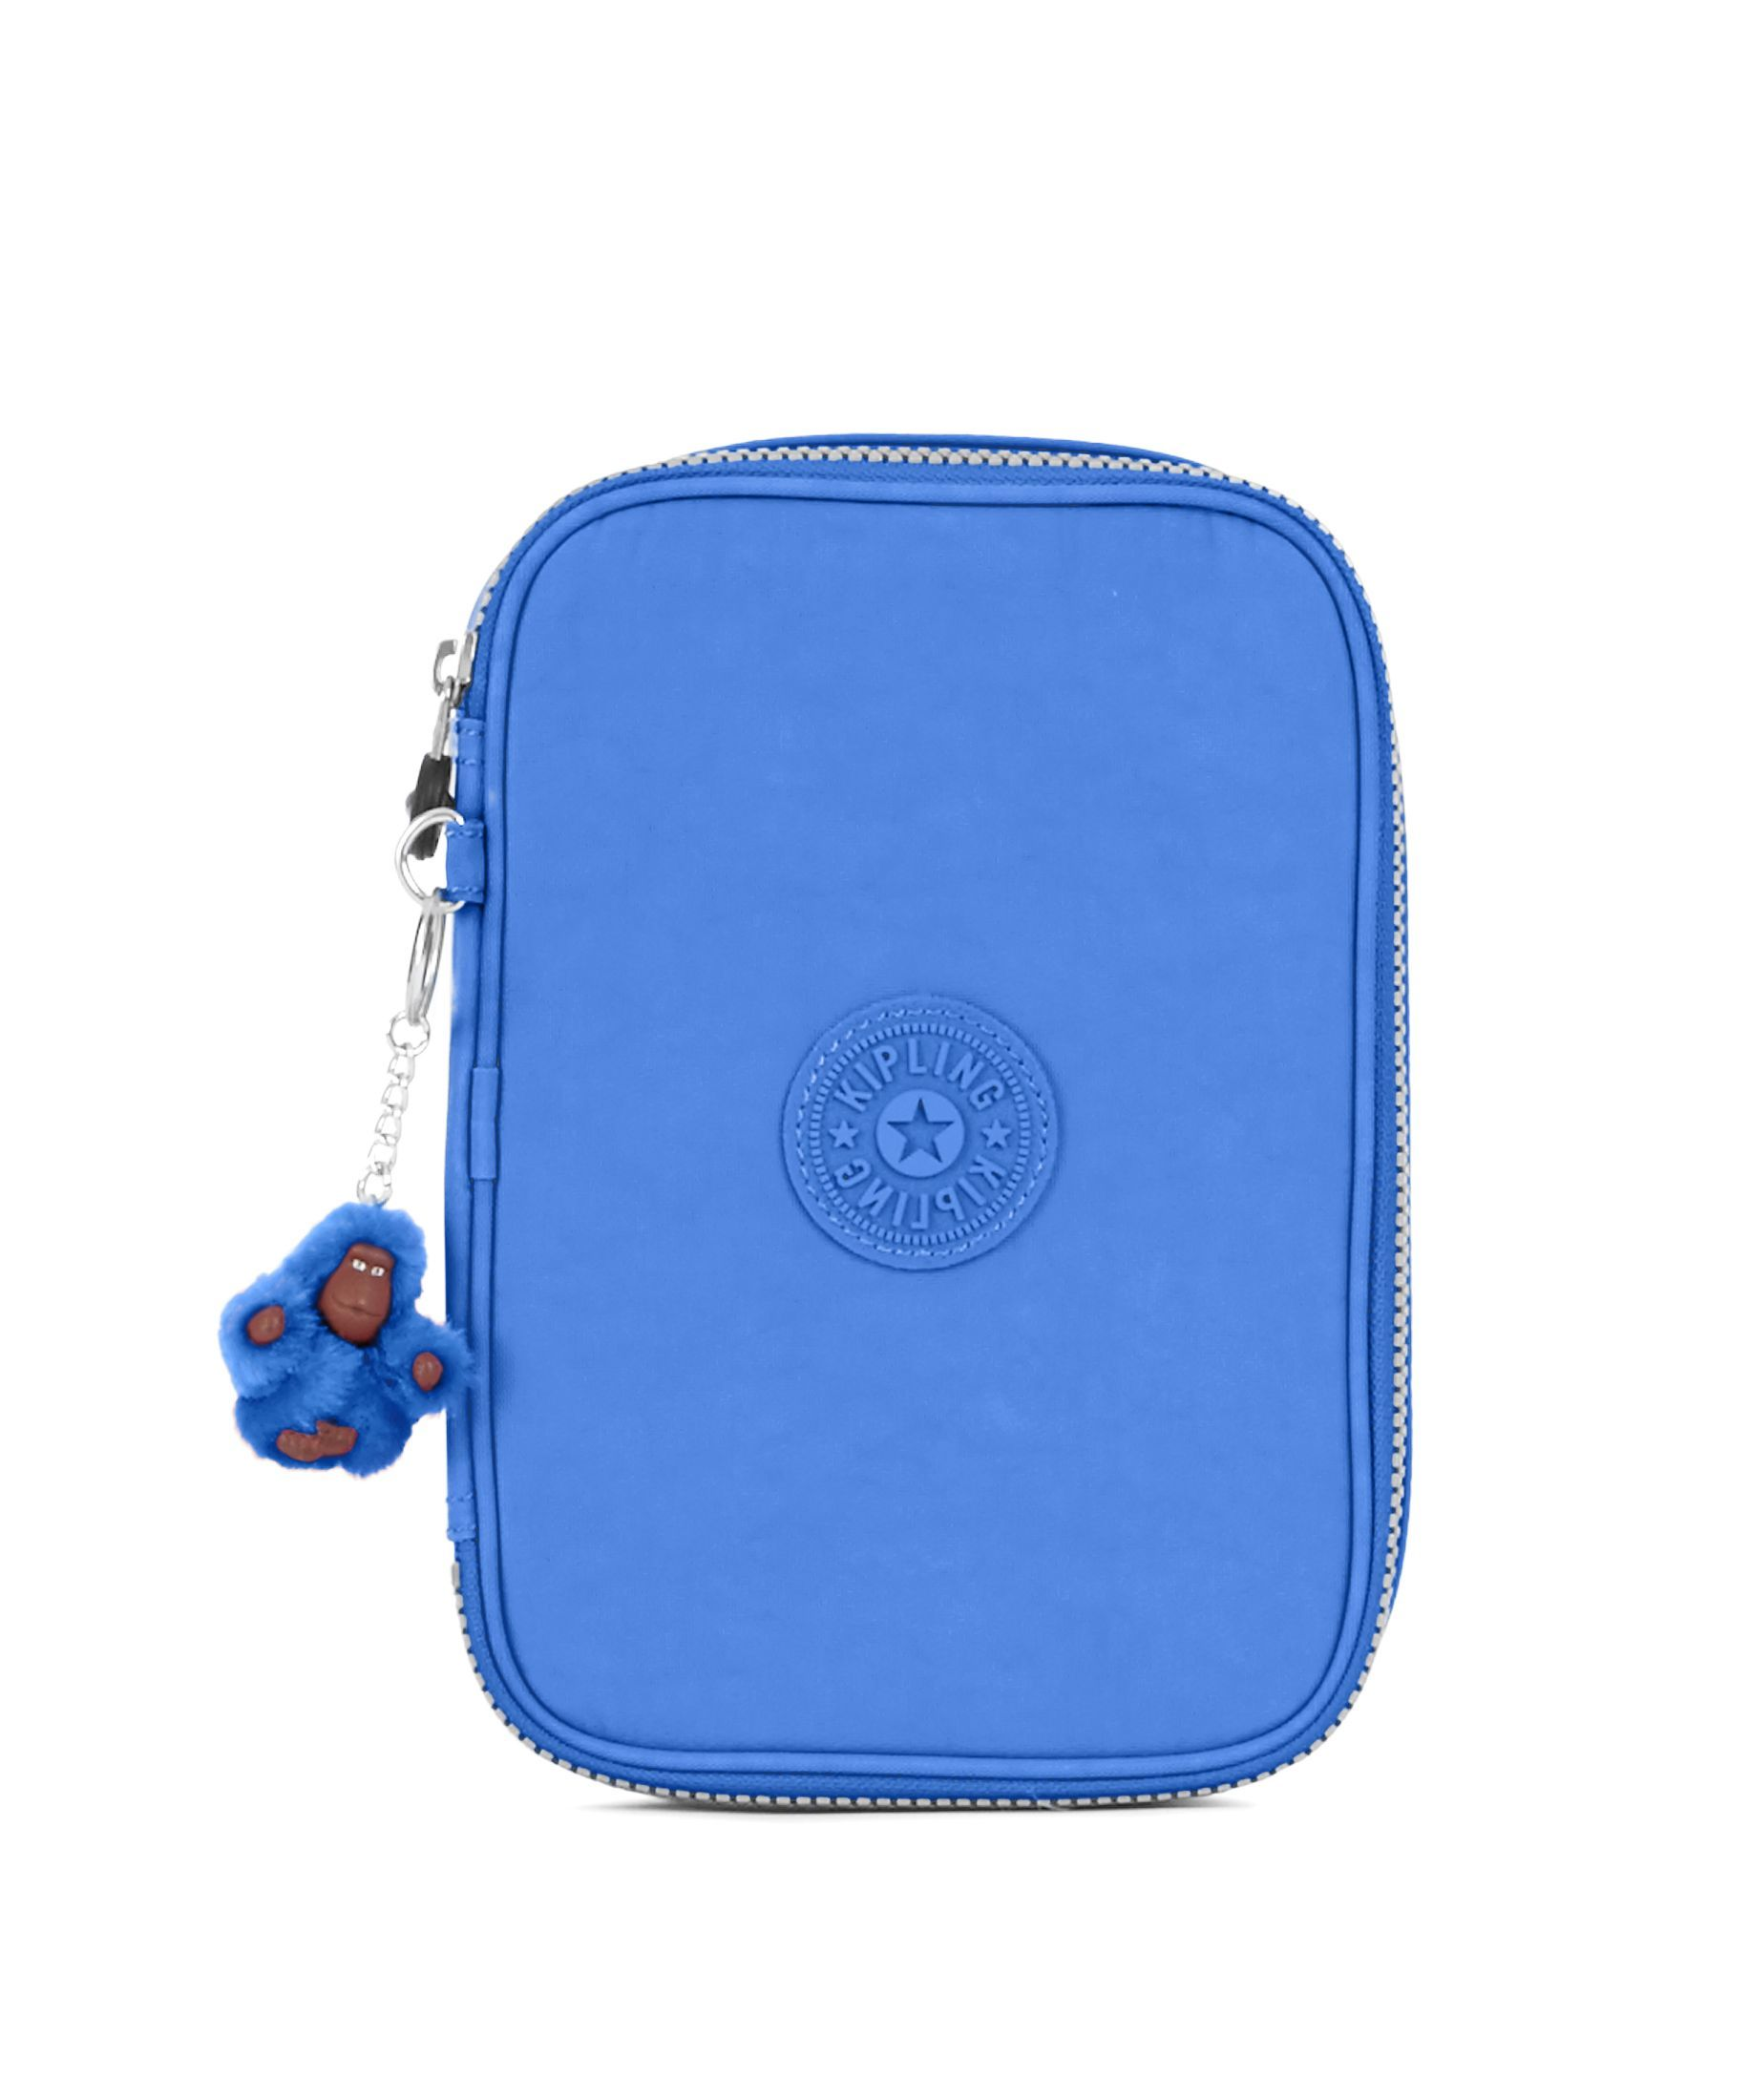 8aafc99f4 100 Pens Case - Sailor Blue | Kipling | Comprar | Estojos kipling ...